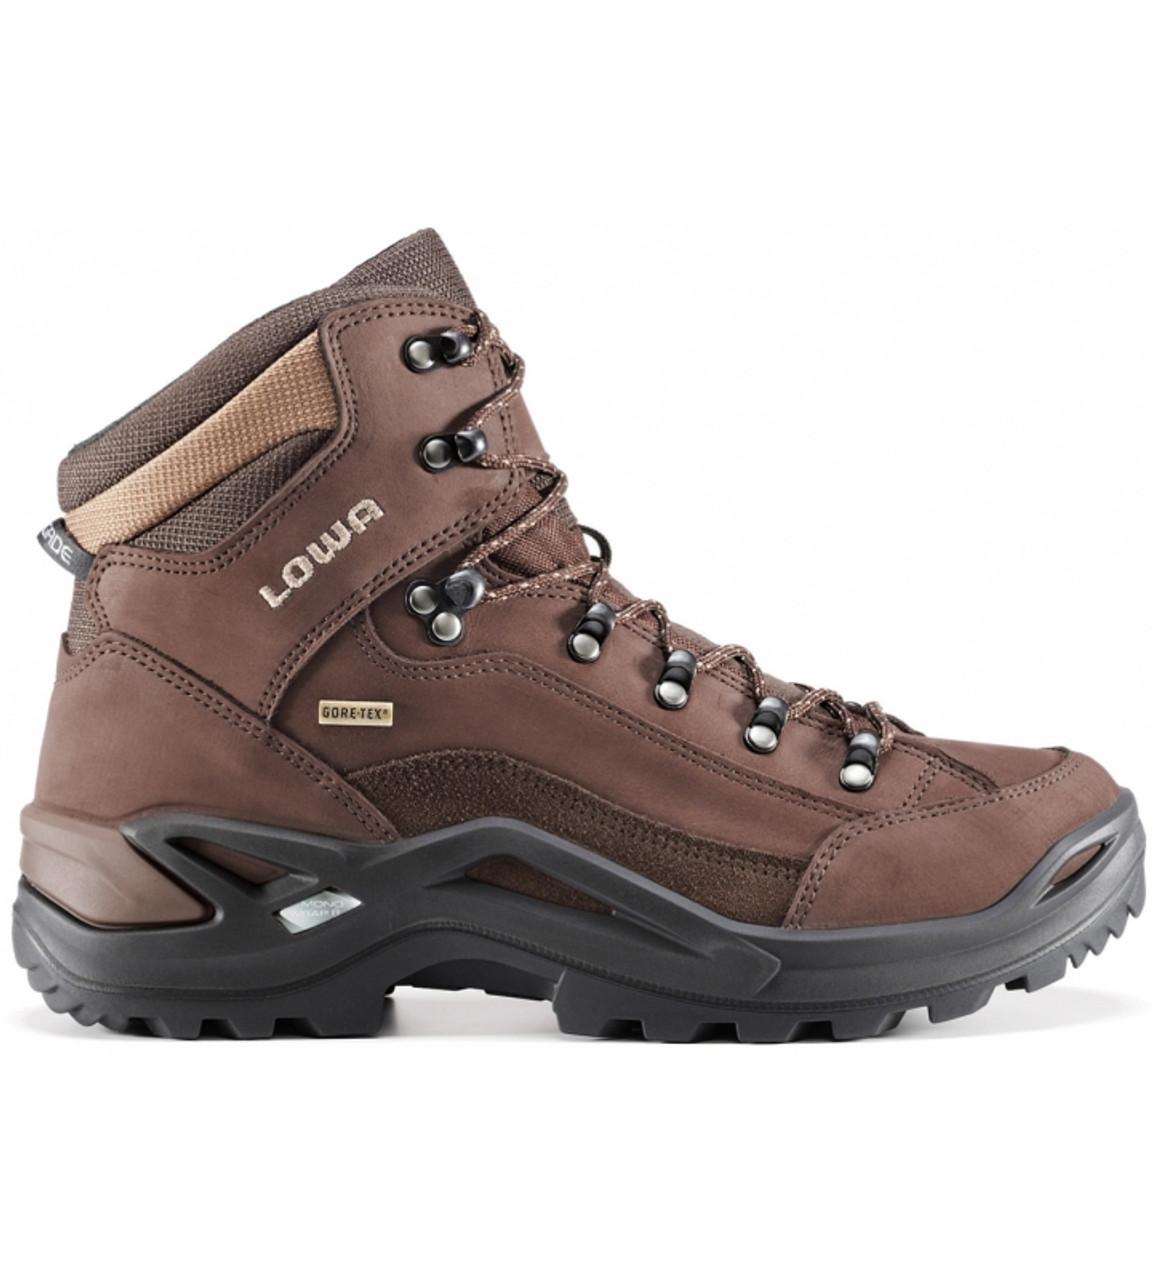 e4da7f61759 Men's Lowa Renegade GTX Mid Hiking Boot